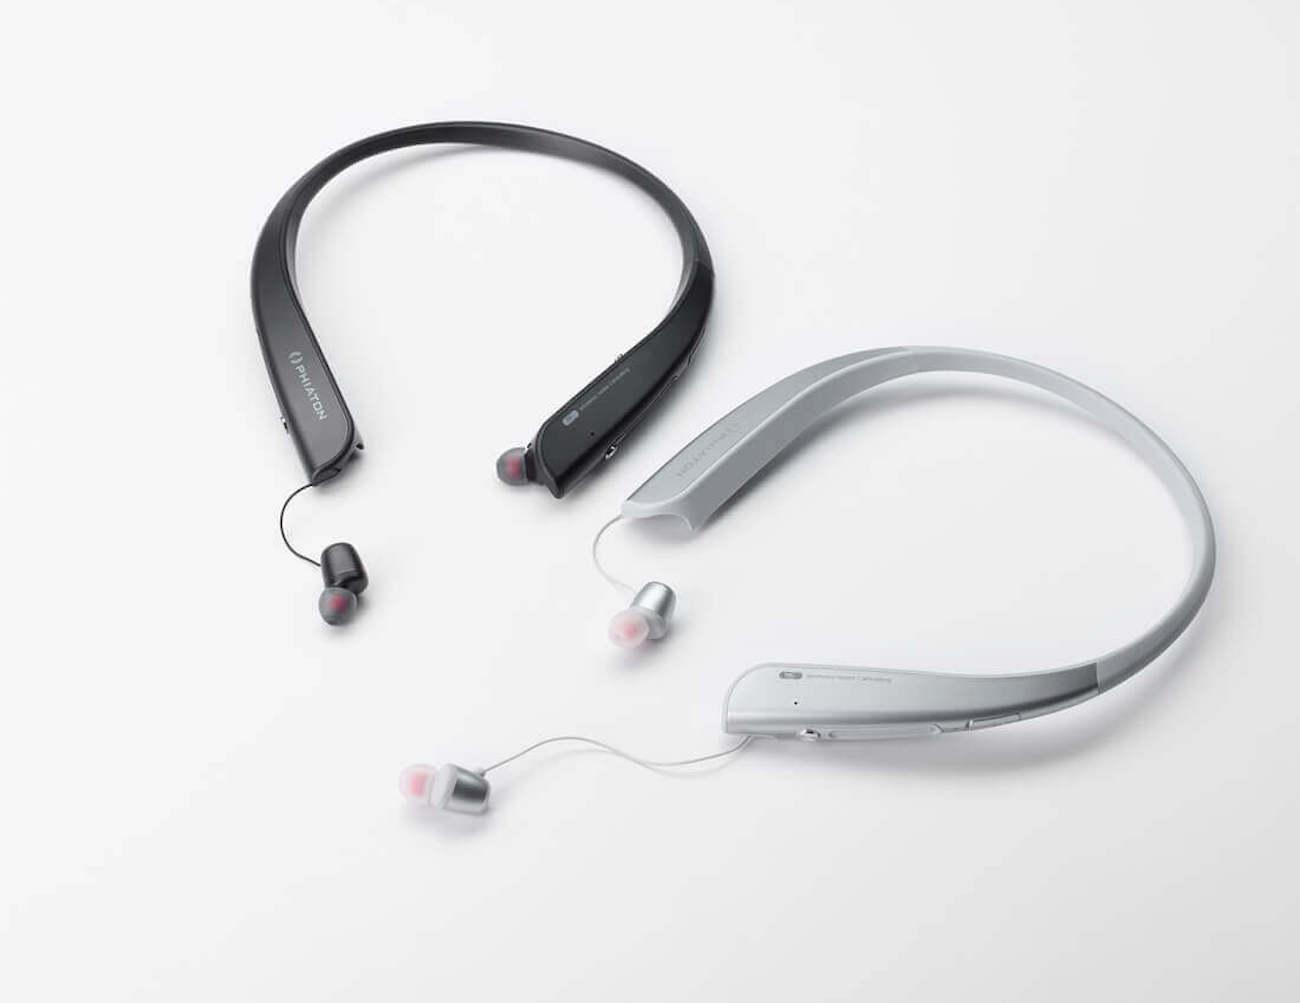 Phiaton BT 150 Wireless Headphone Neckband